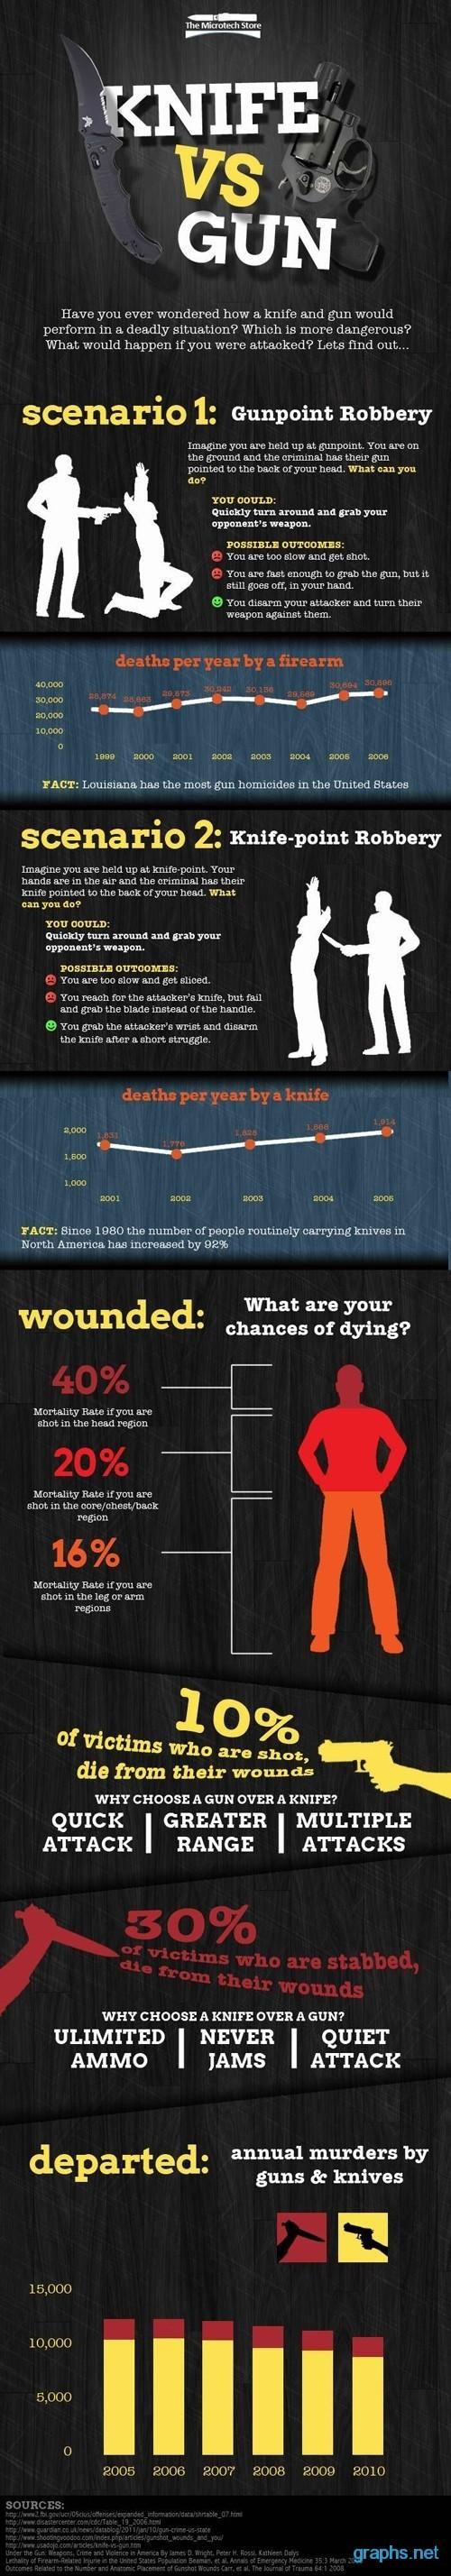 Knife and Gun Comparison